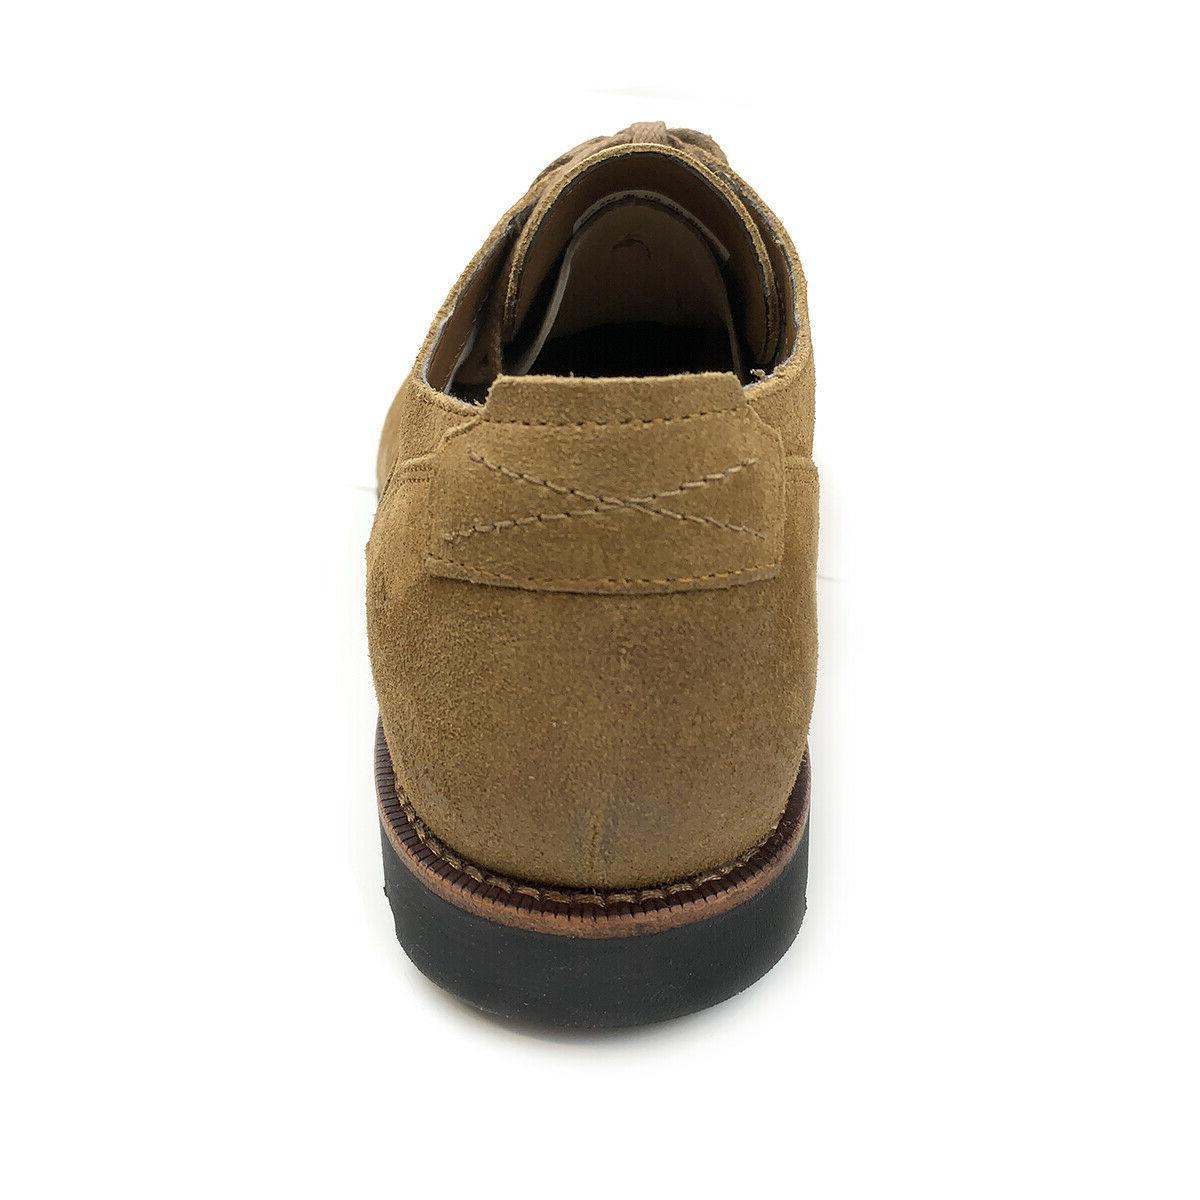 Timberland Men's Toe Medium Oxford Shoes